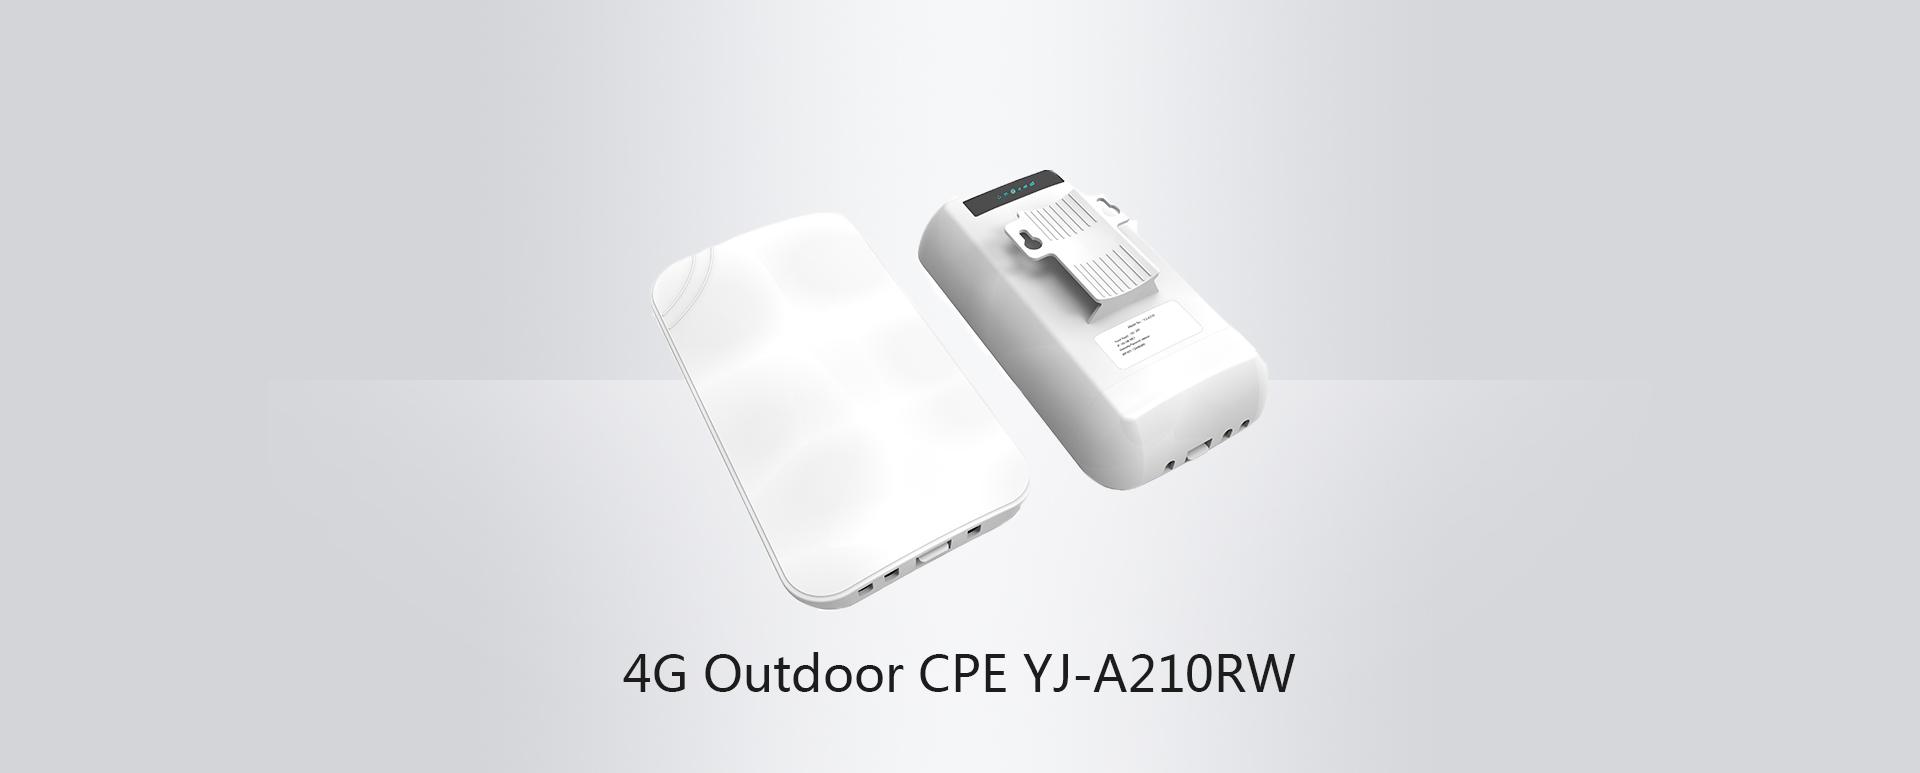 4G CPE YJ-A210RW